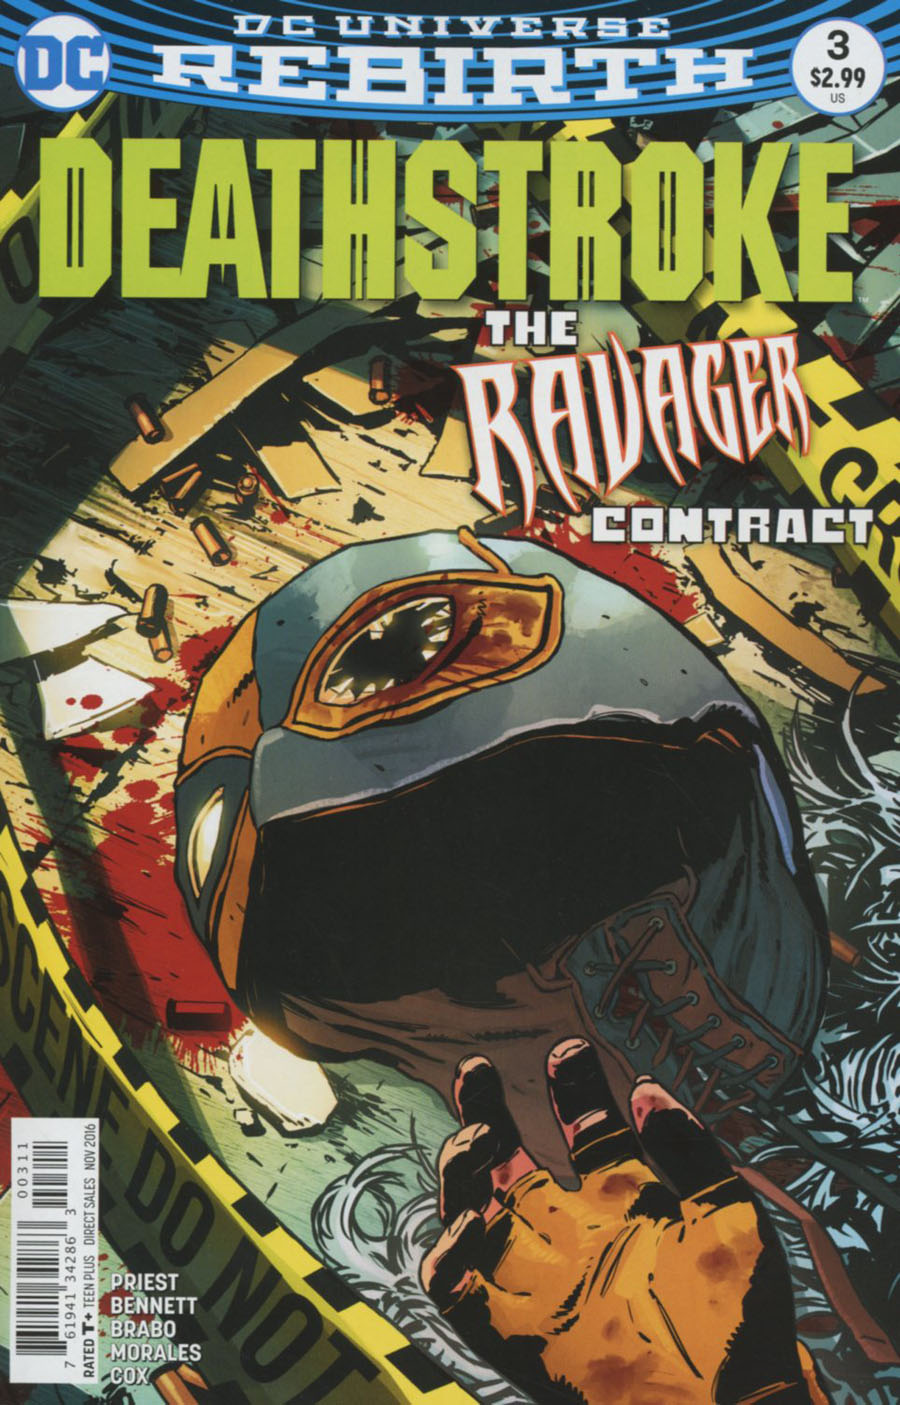 Deathstroke Vol 4 #3 Cover A Regular Aco Cover